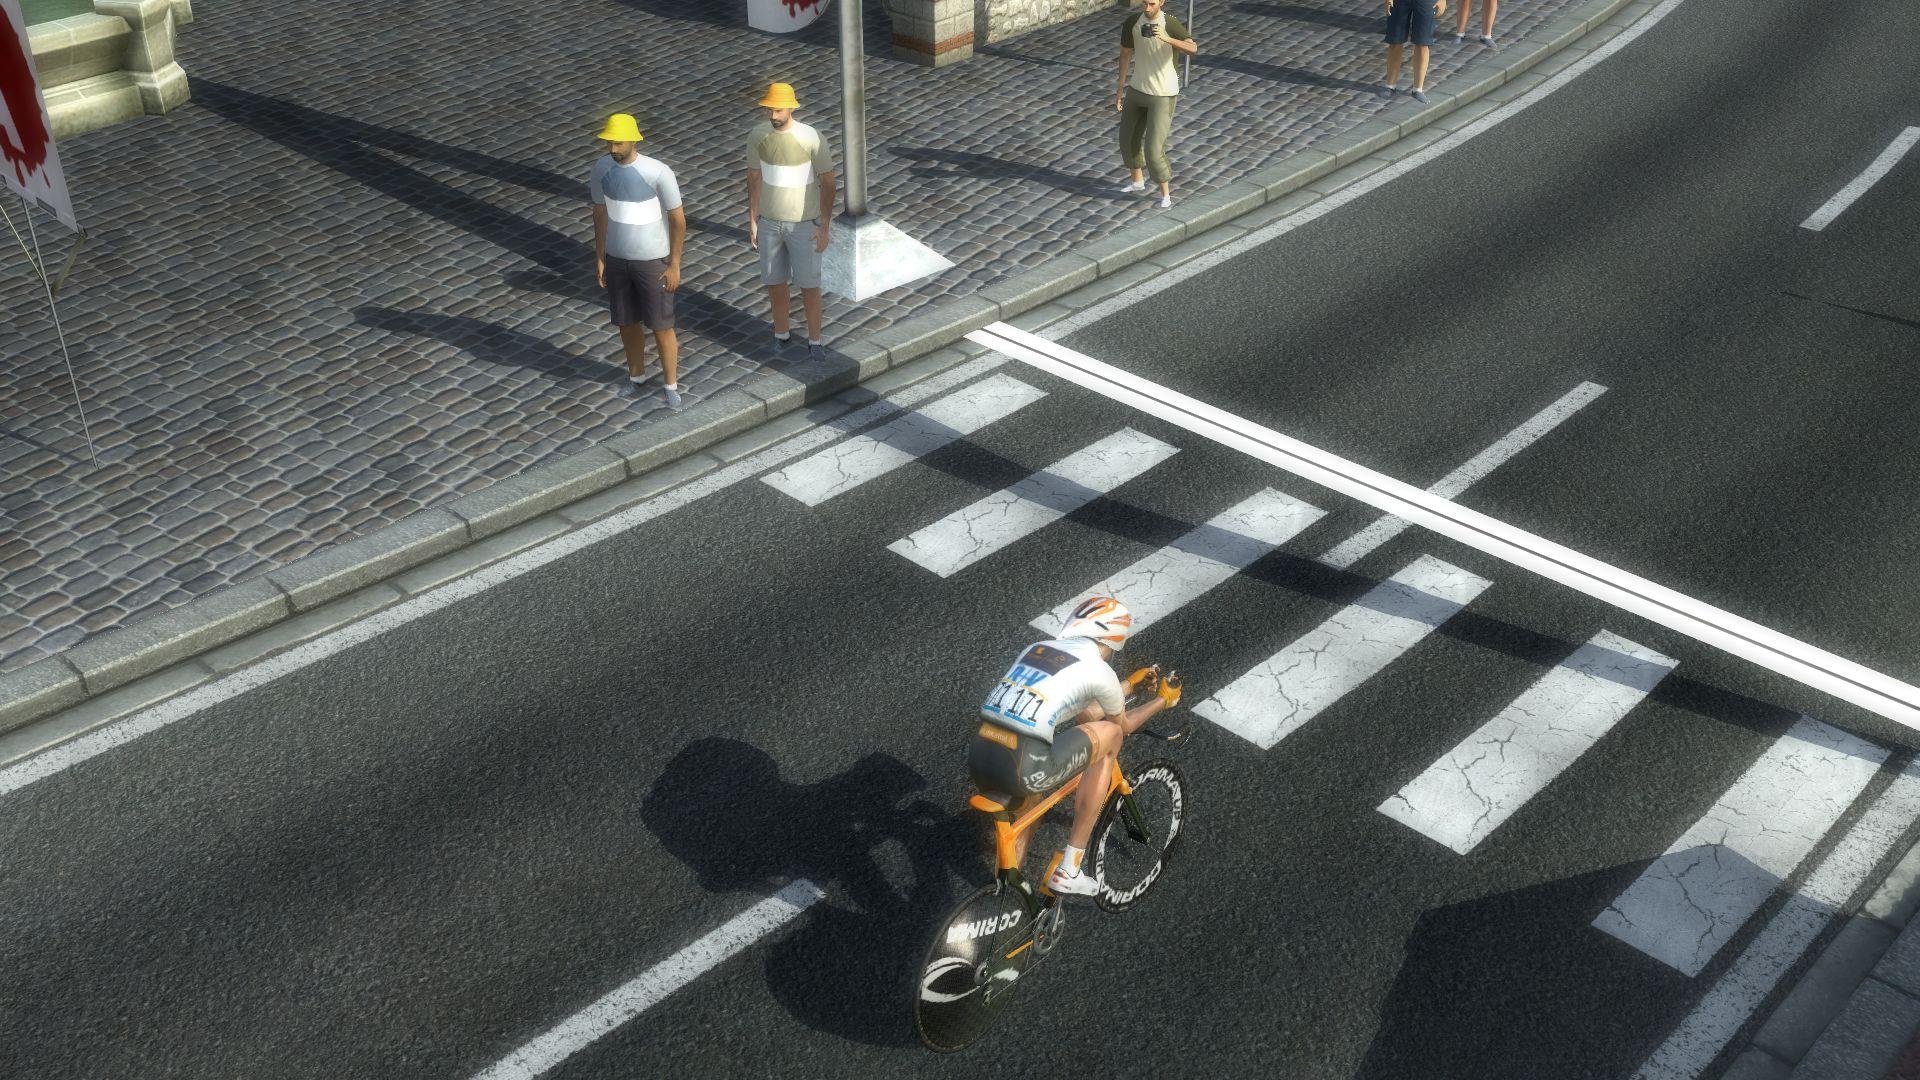 pcmdaily.com/images/mg/2019/Races/C1/Bayern/S4/mg19_bay_s04_25.jpg